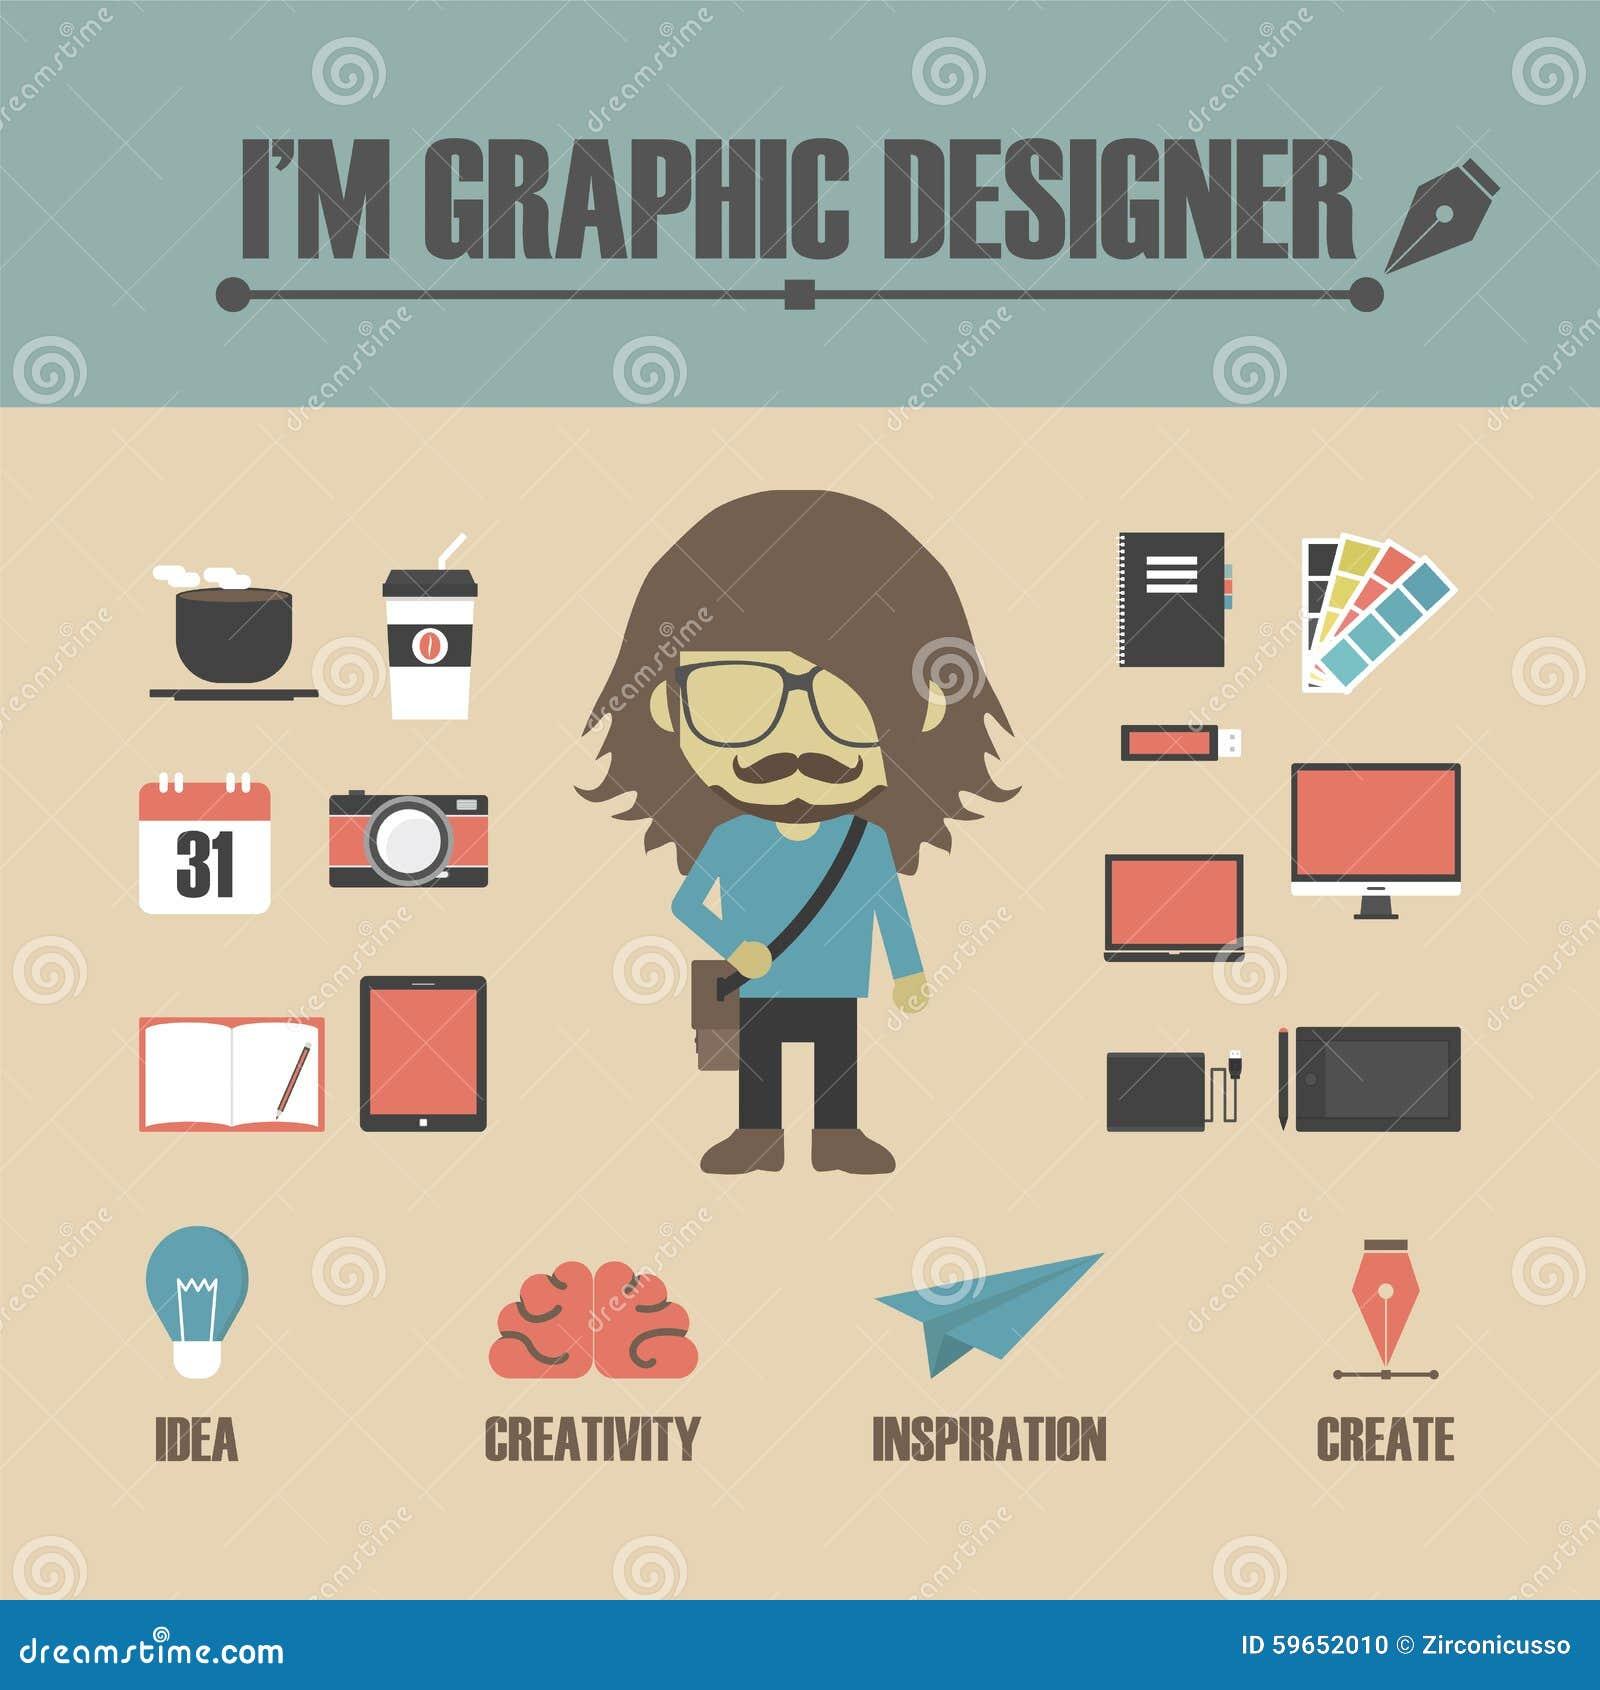 graphic designer stock vector image 59652010 graphic designs clipart graphic design element clipart free